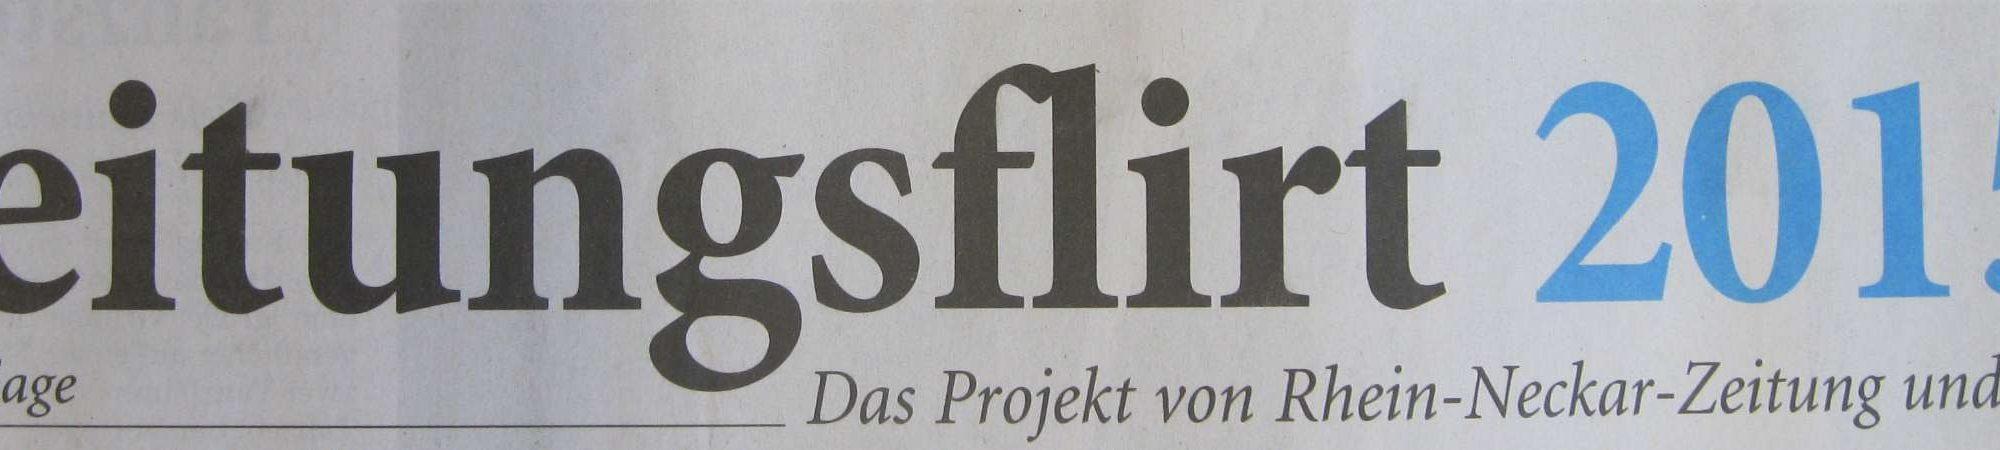 Zeitungsflirt-01